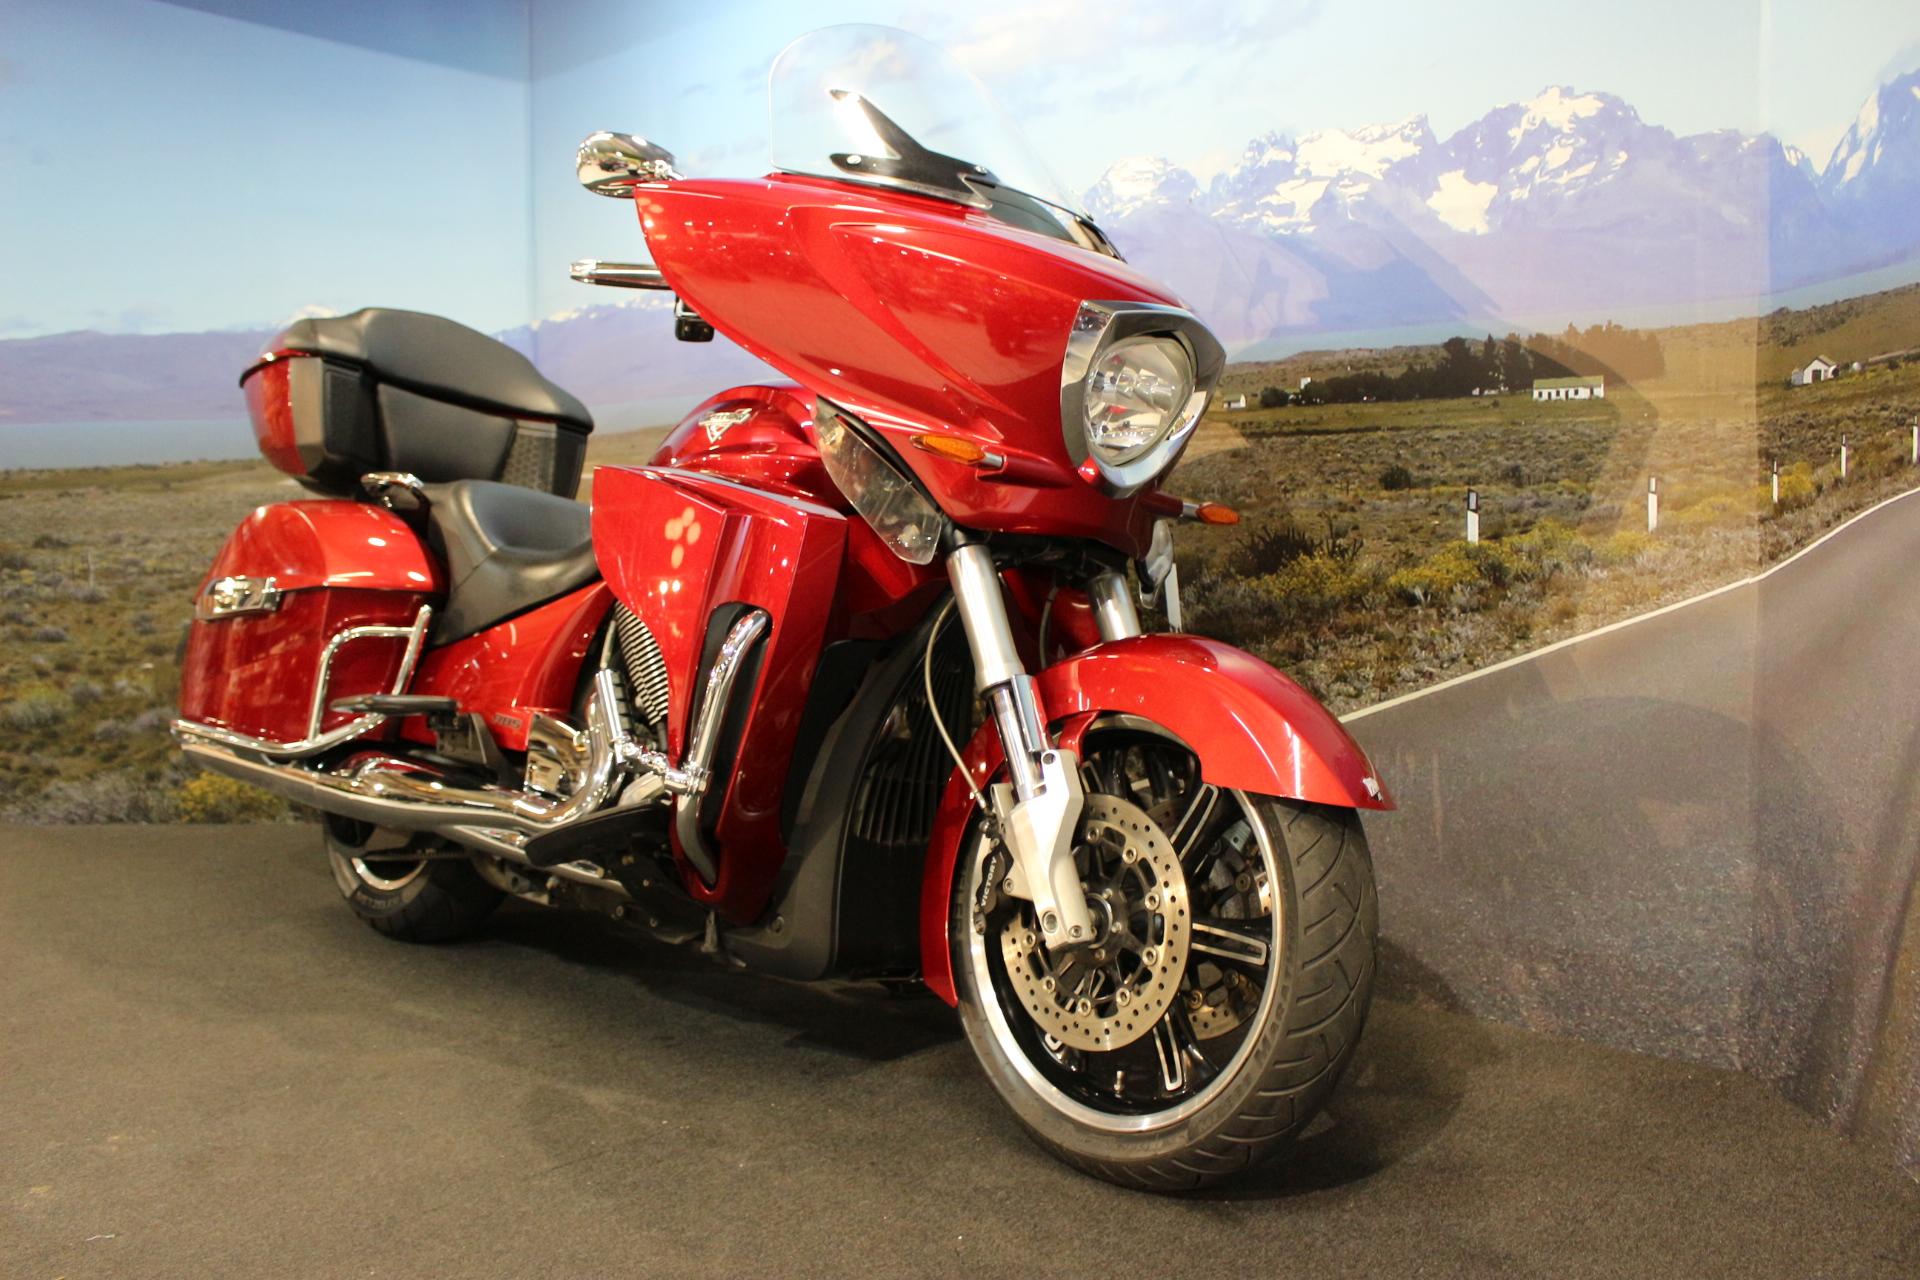 achat moto marque indian d 39 occasion s te 34 guichard moto